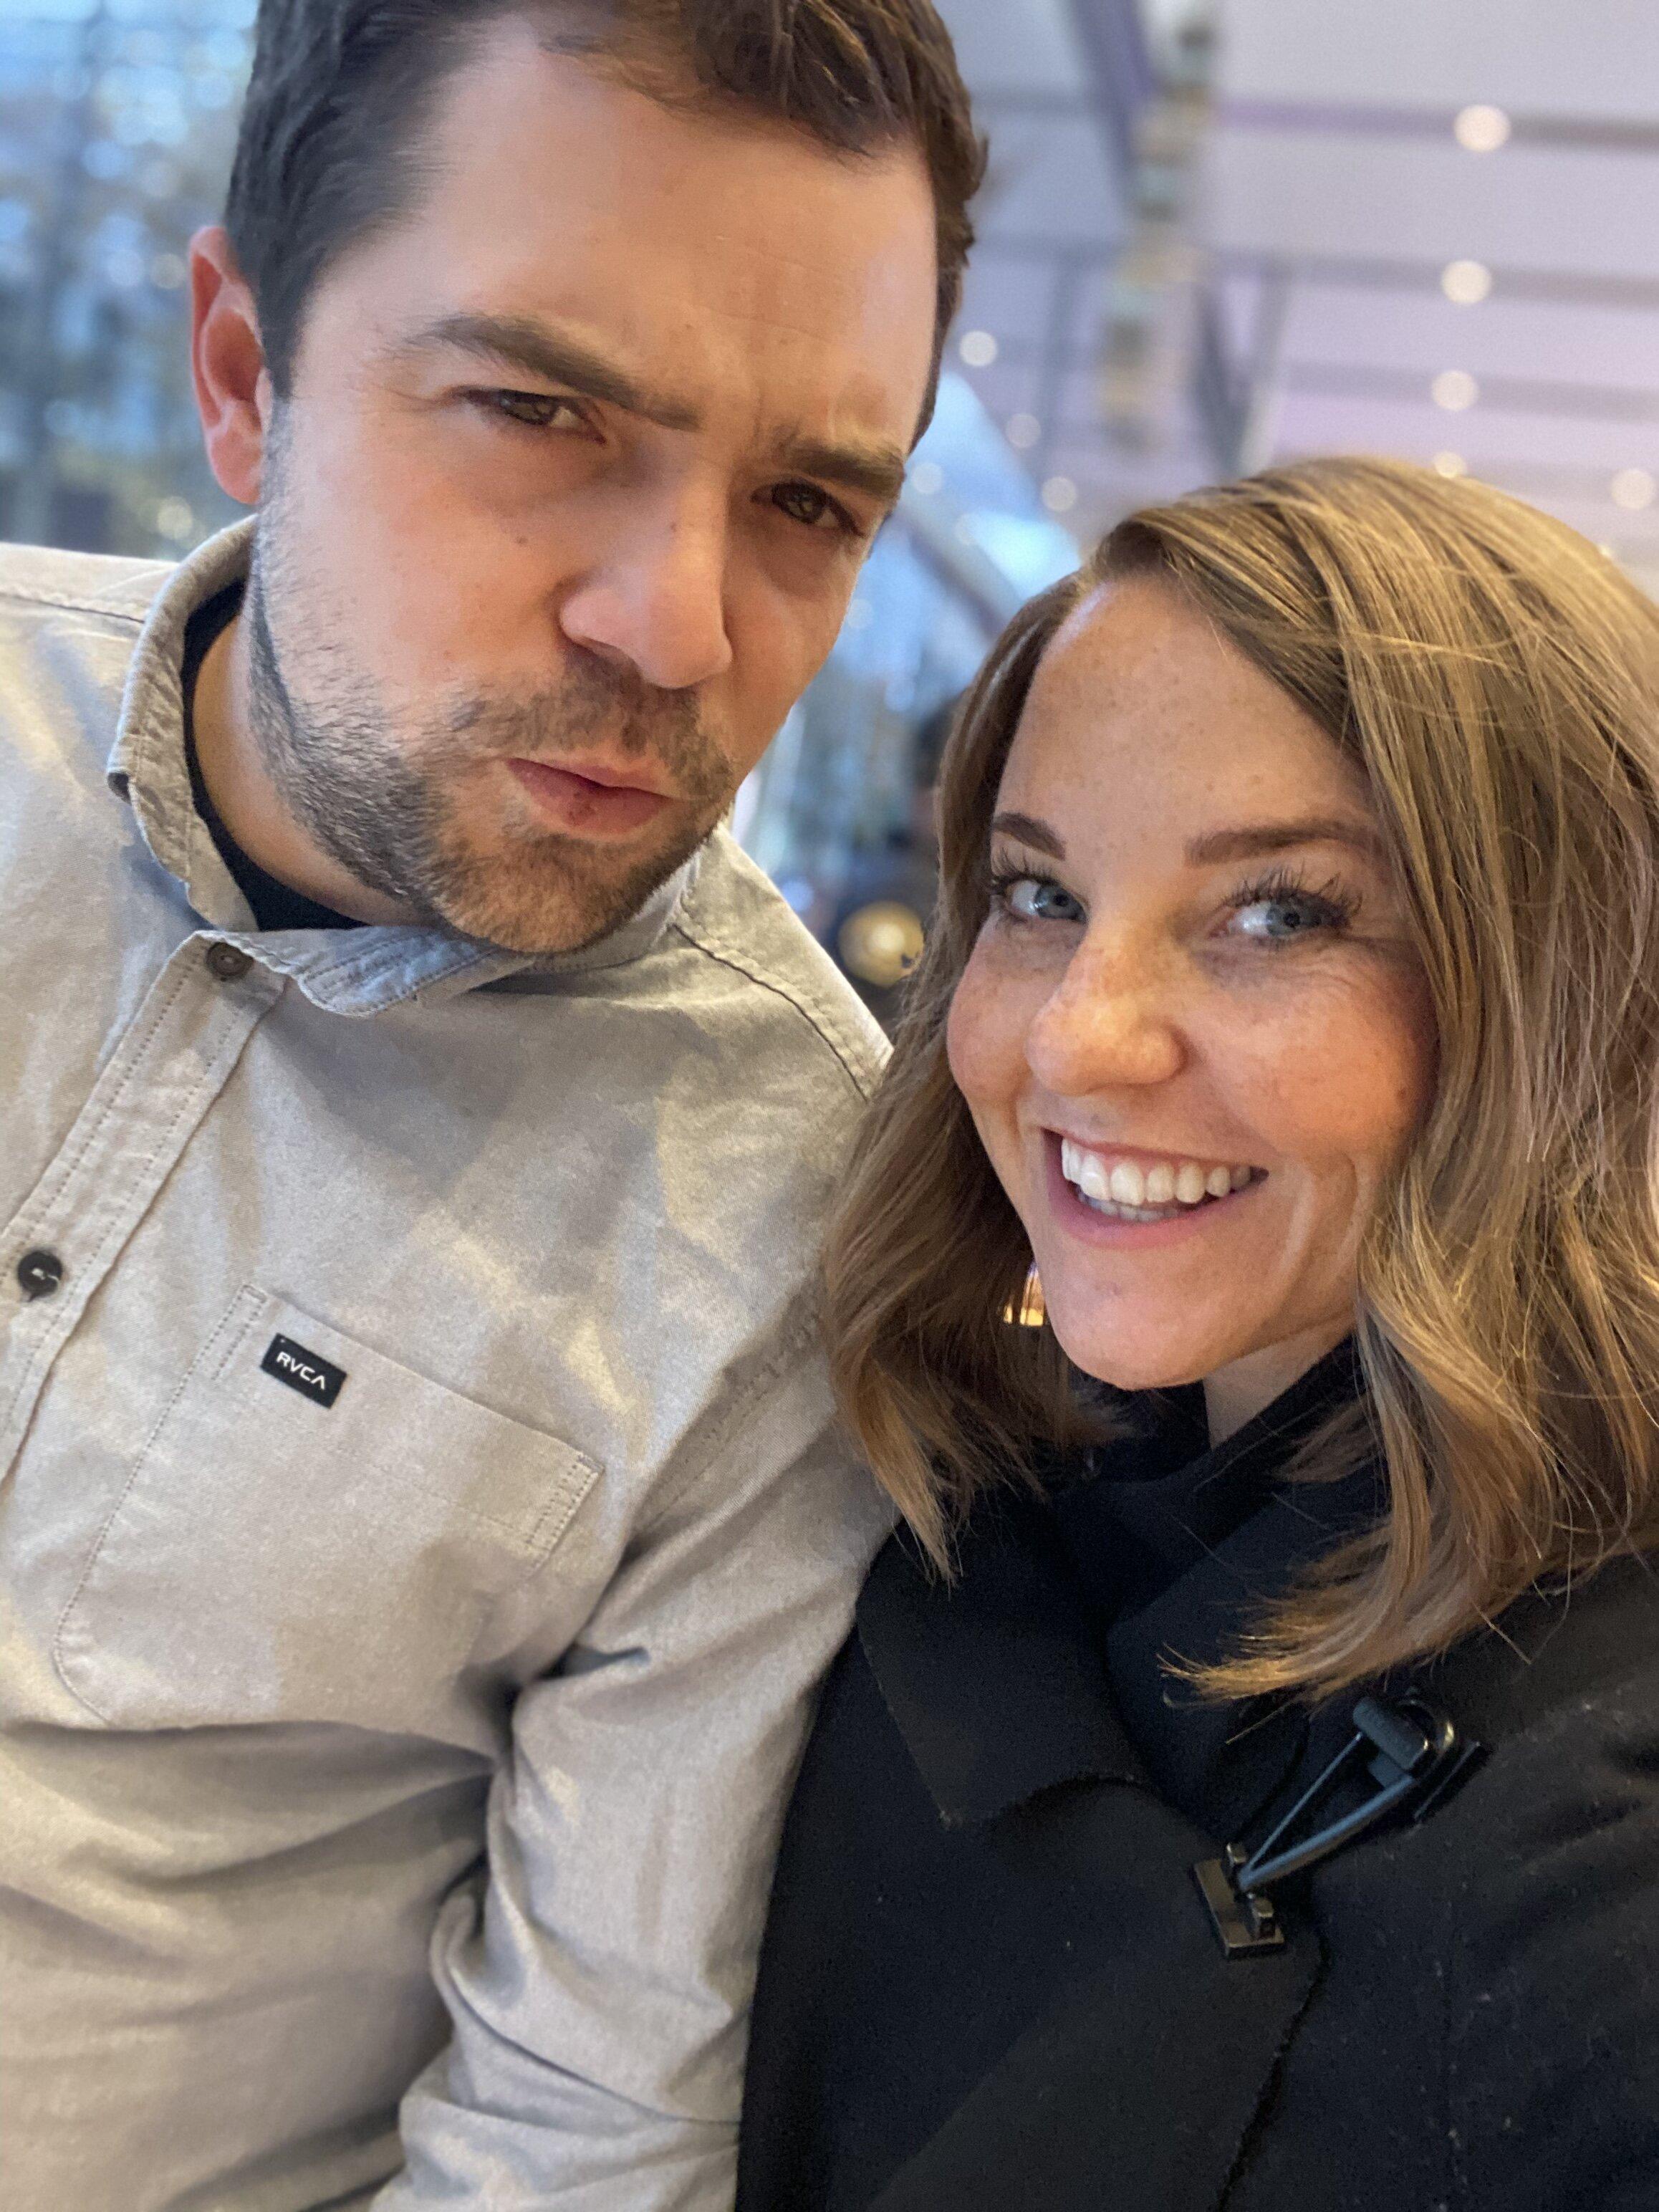 2019 Justin + Paige | Apple Store iPhone 11 Pro Selfie |Portland, Oregon